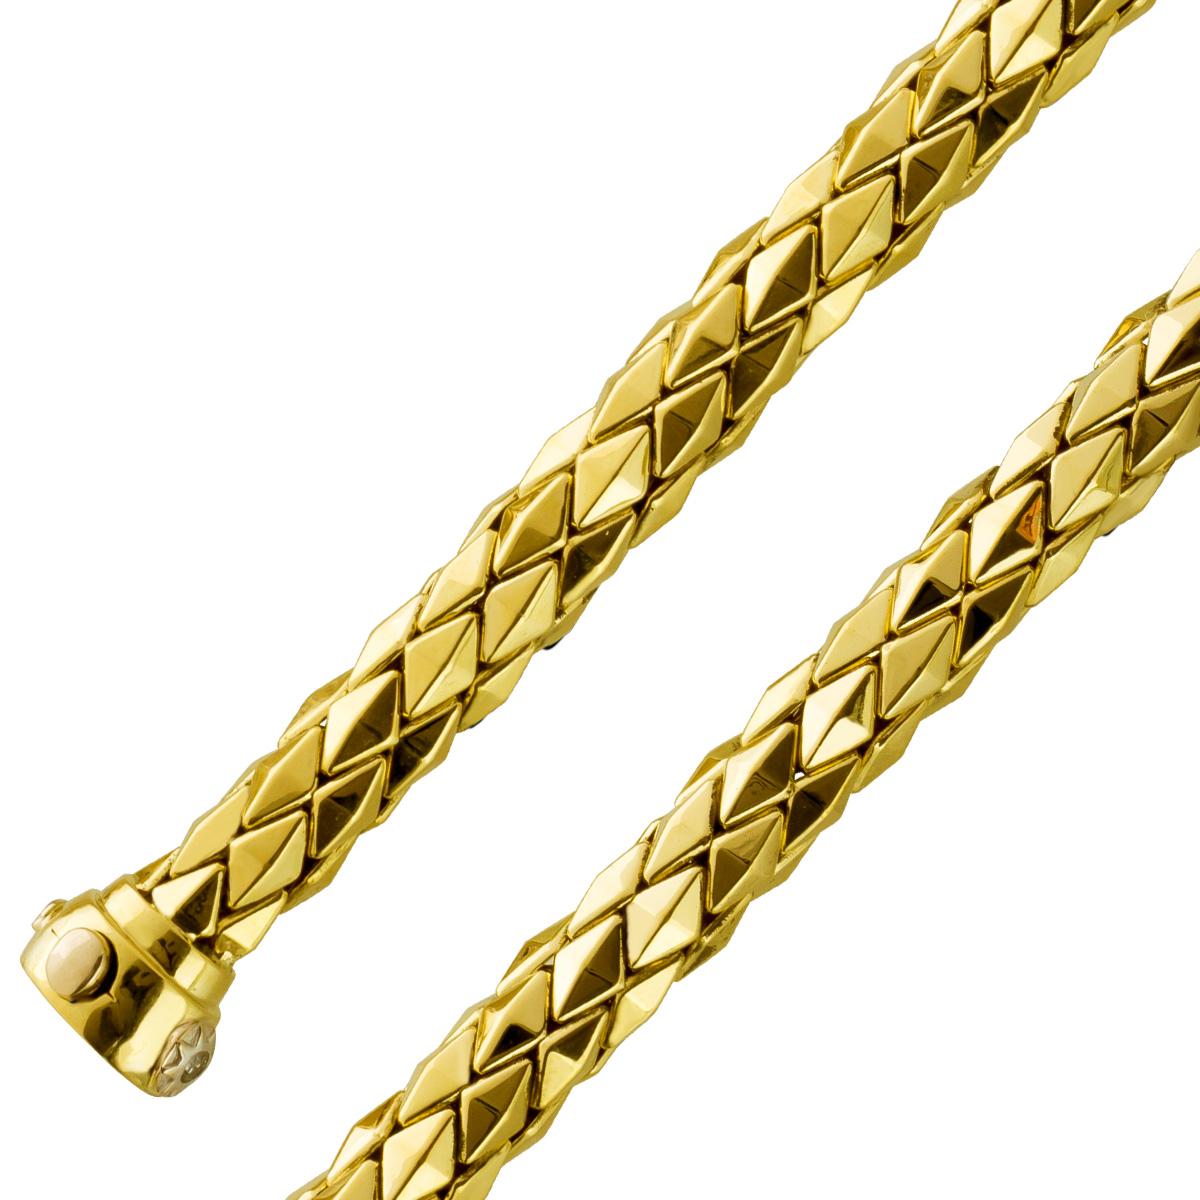 Chimento Armreif/Armband Gelbgold750 Diamant Brillant 0